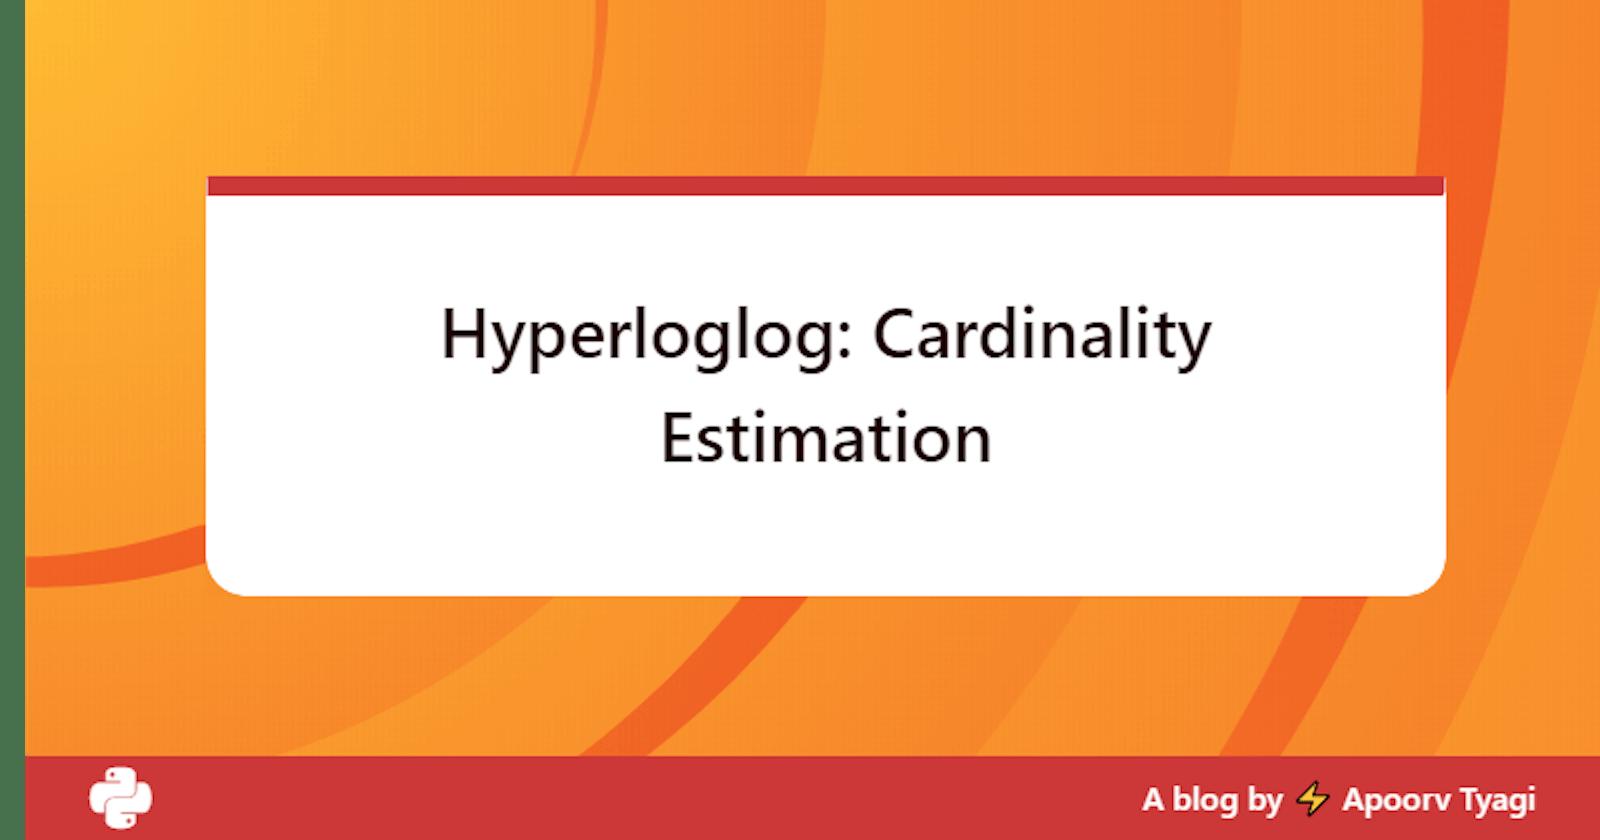 Hyperloglog: Cardinality Estimation